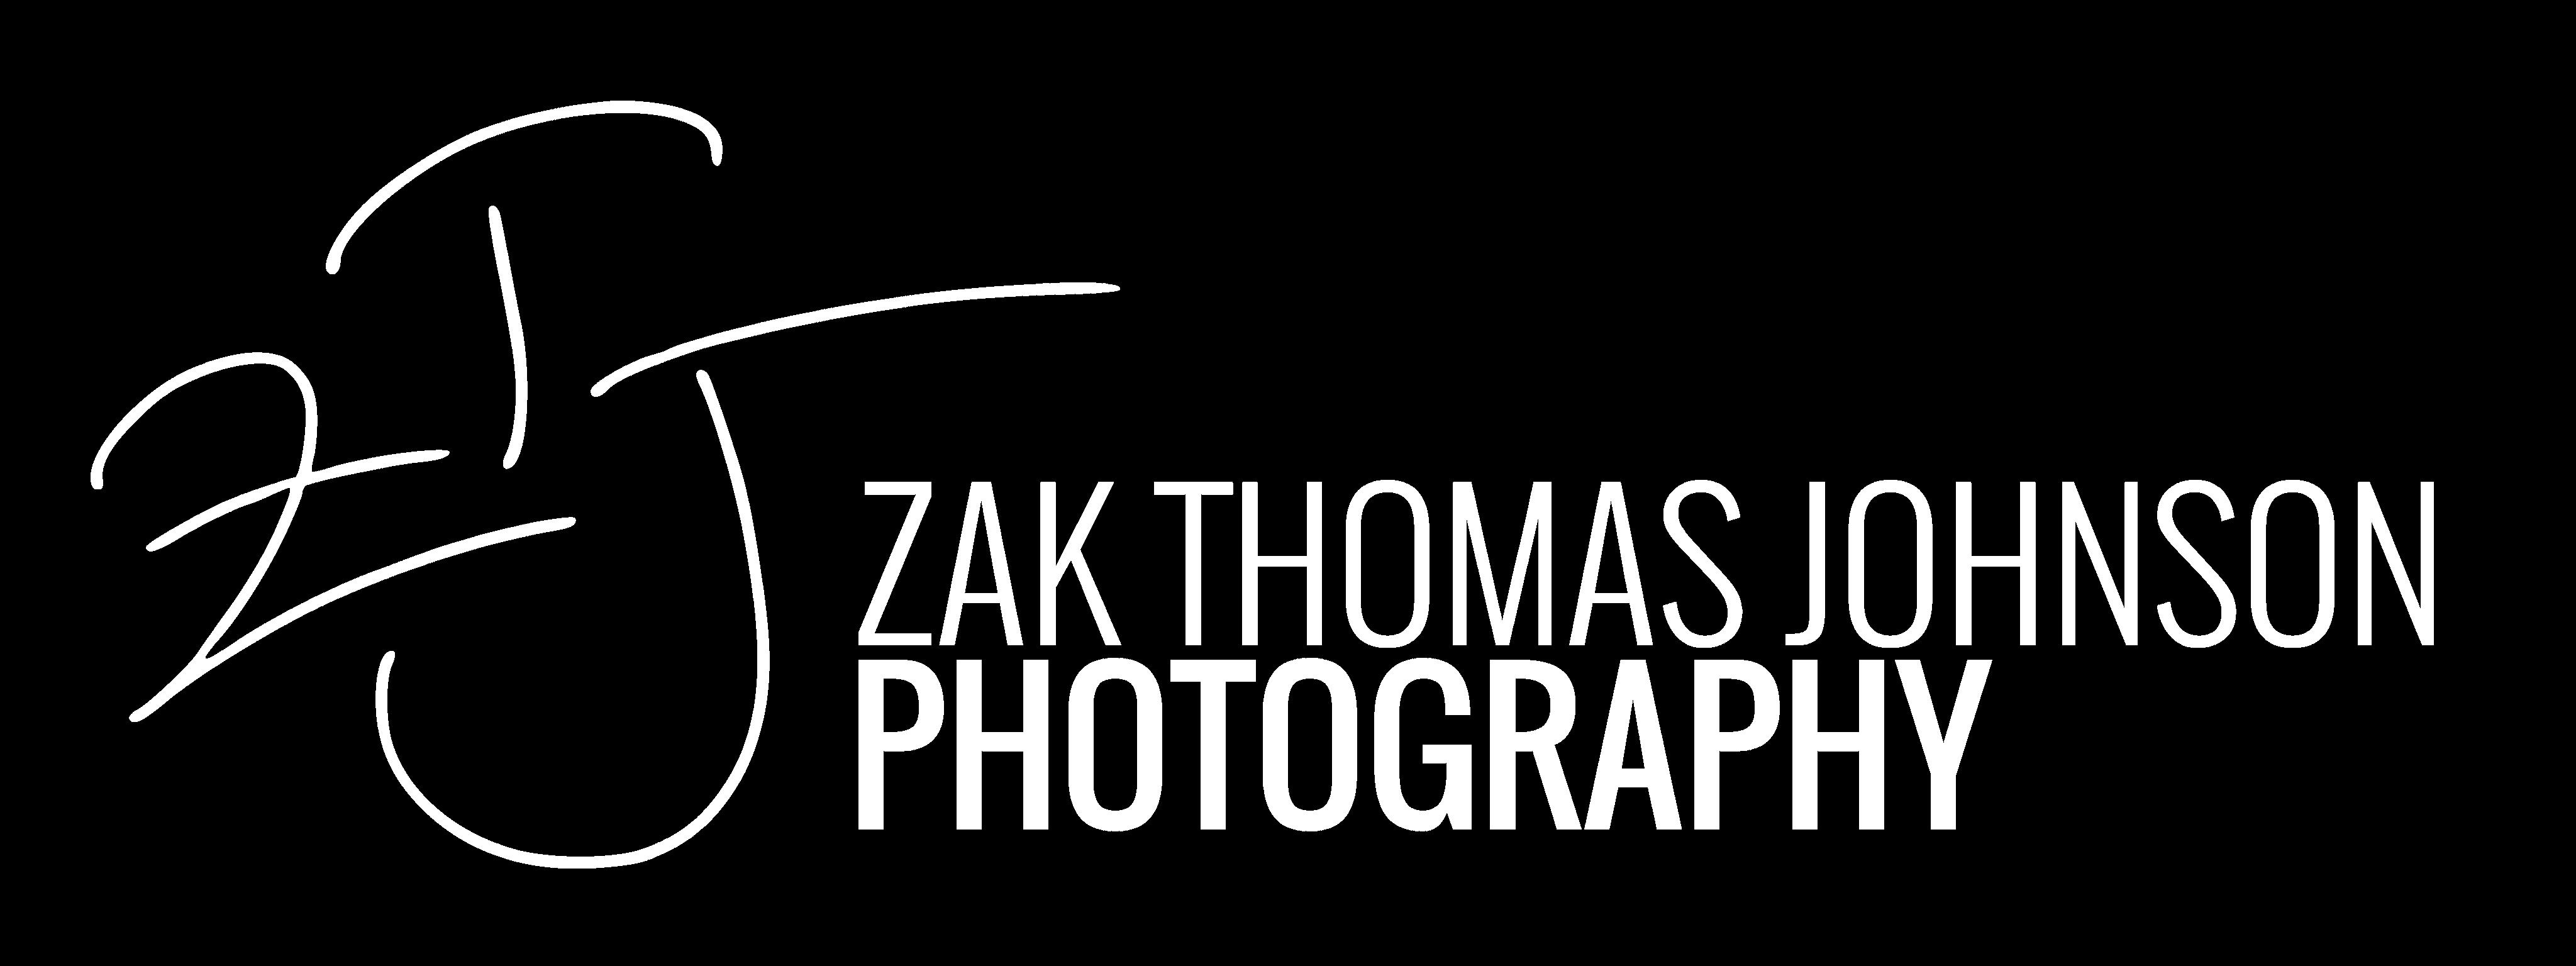 Zak Thomas Johnson Photography